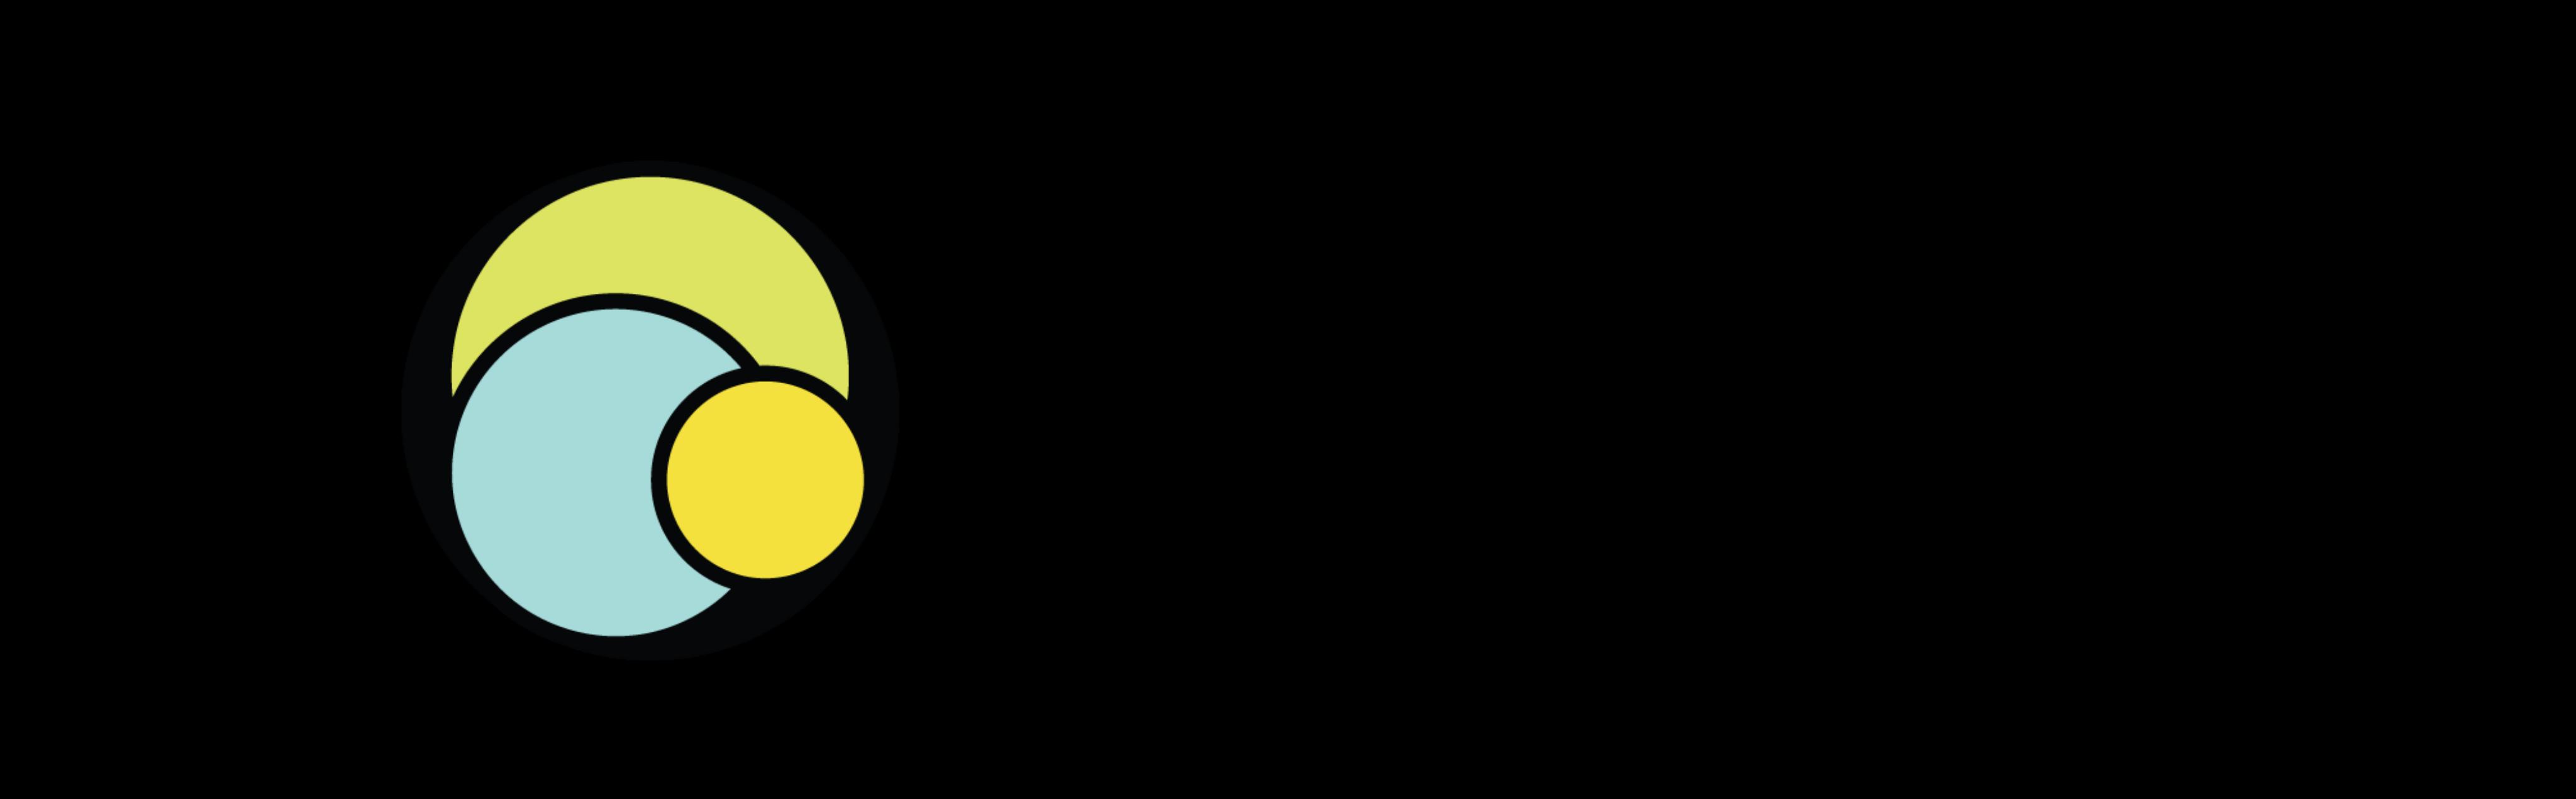 PagBank Logo - PNG e Vetor - Download de Logo